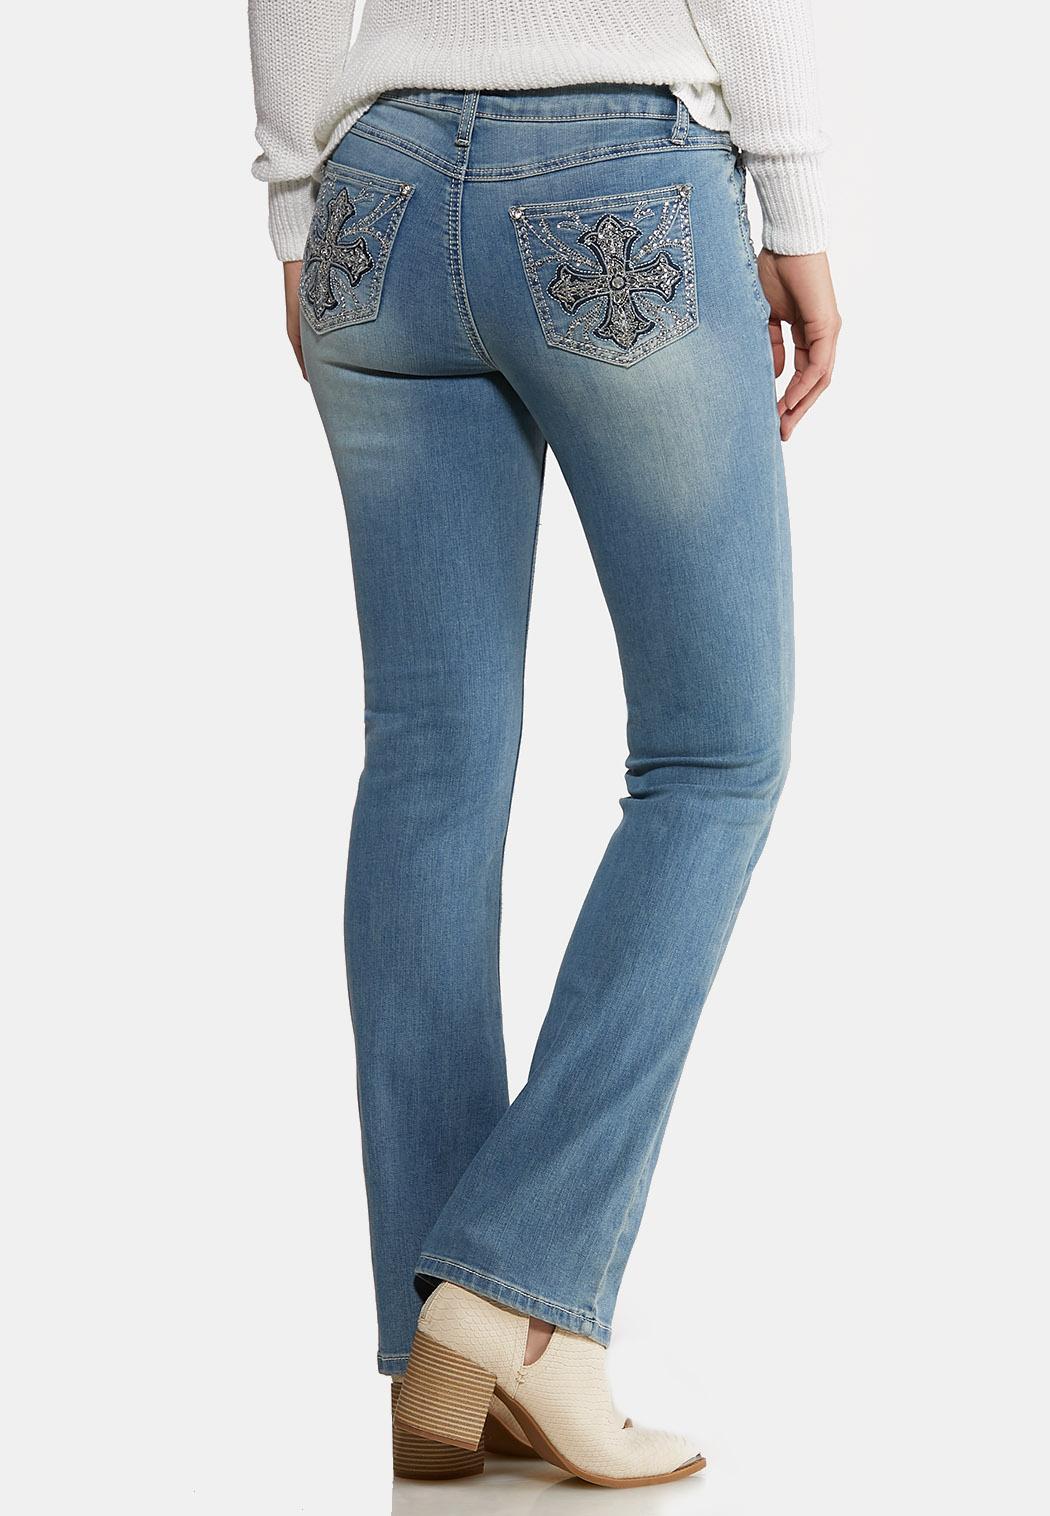 Petite Cross Pocket Jeans